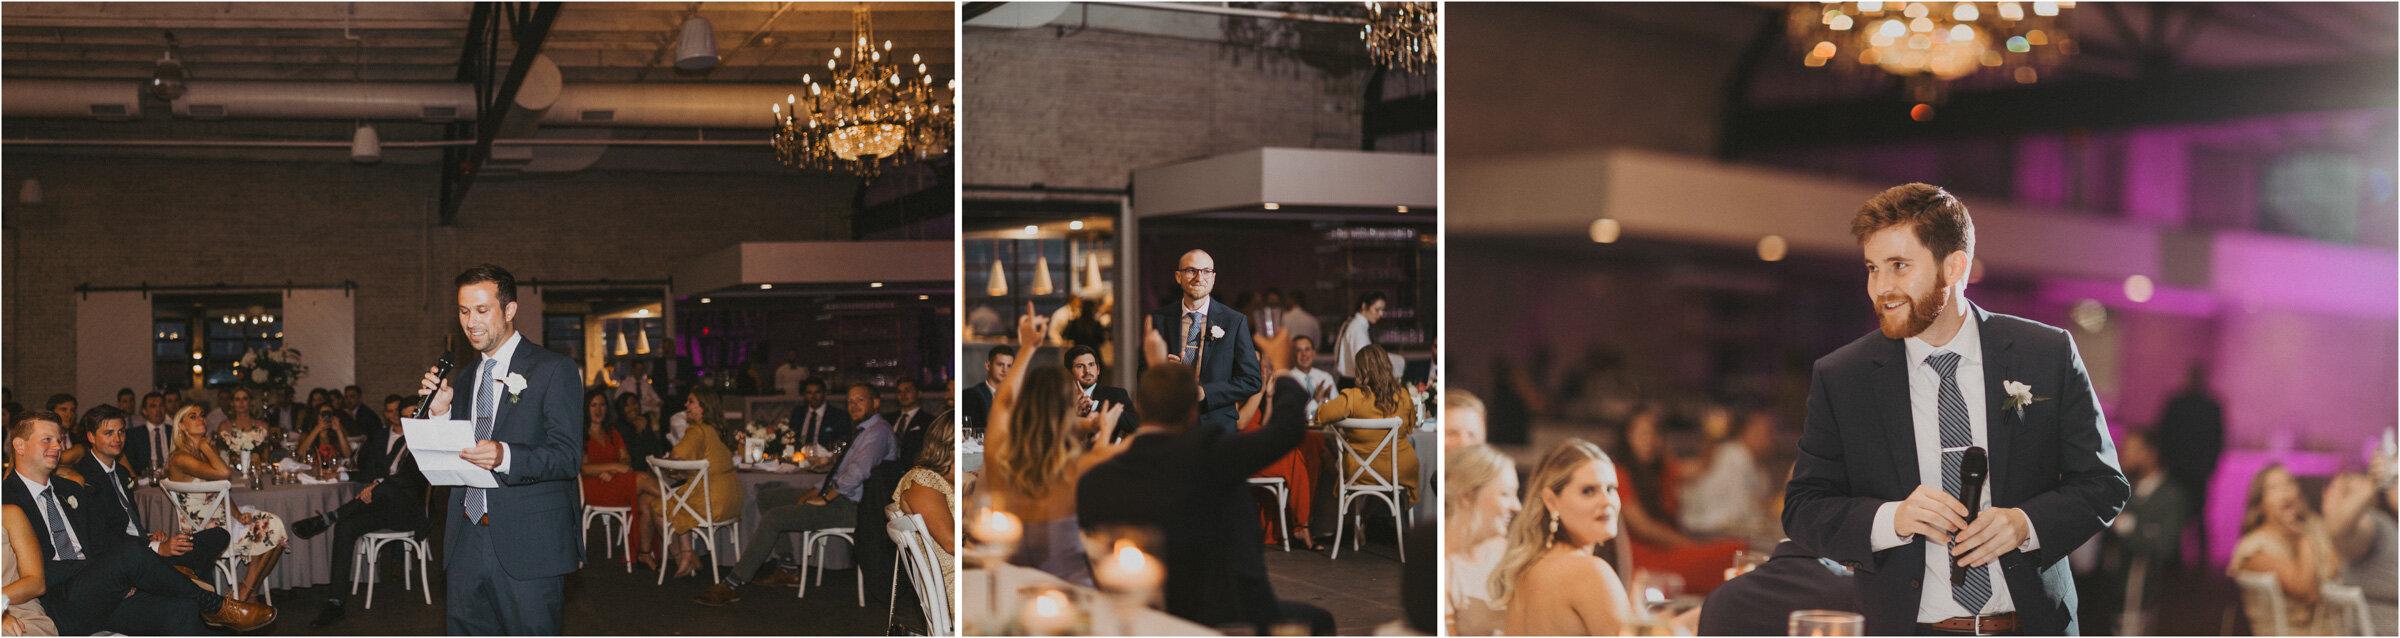 alyssa barletter photography the abbott kansas city summer wedding-50.jpg